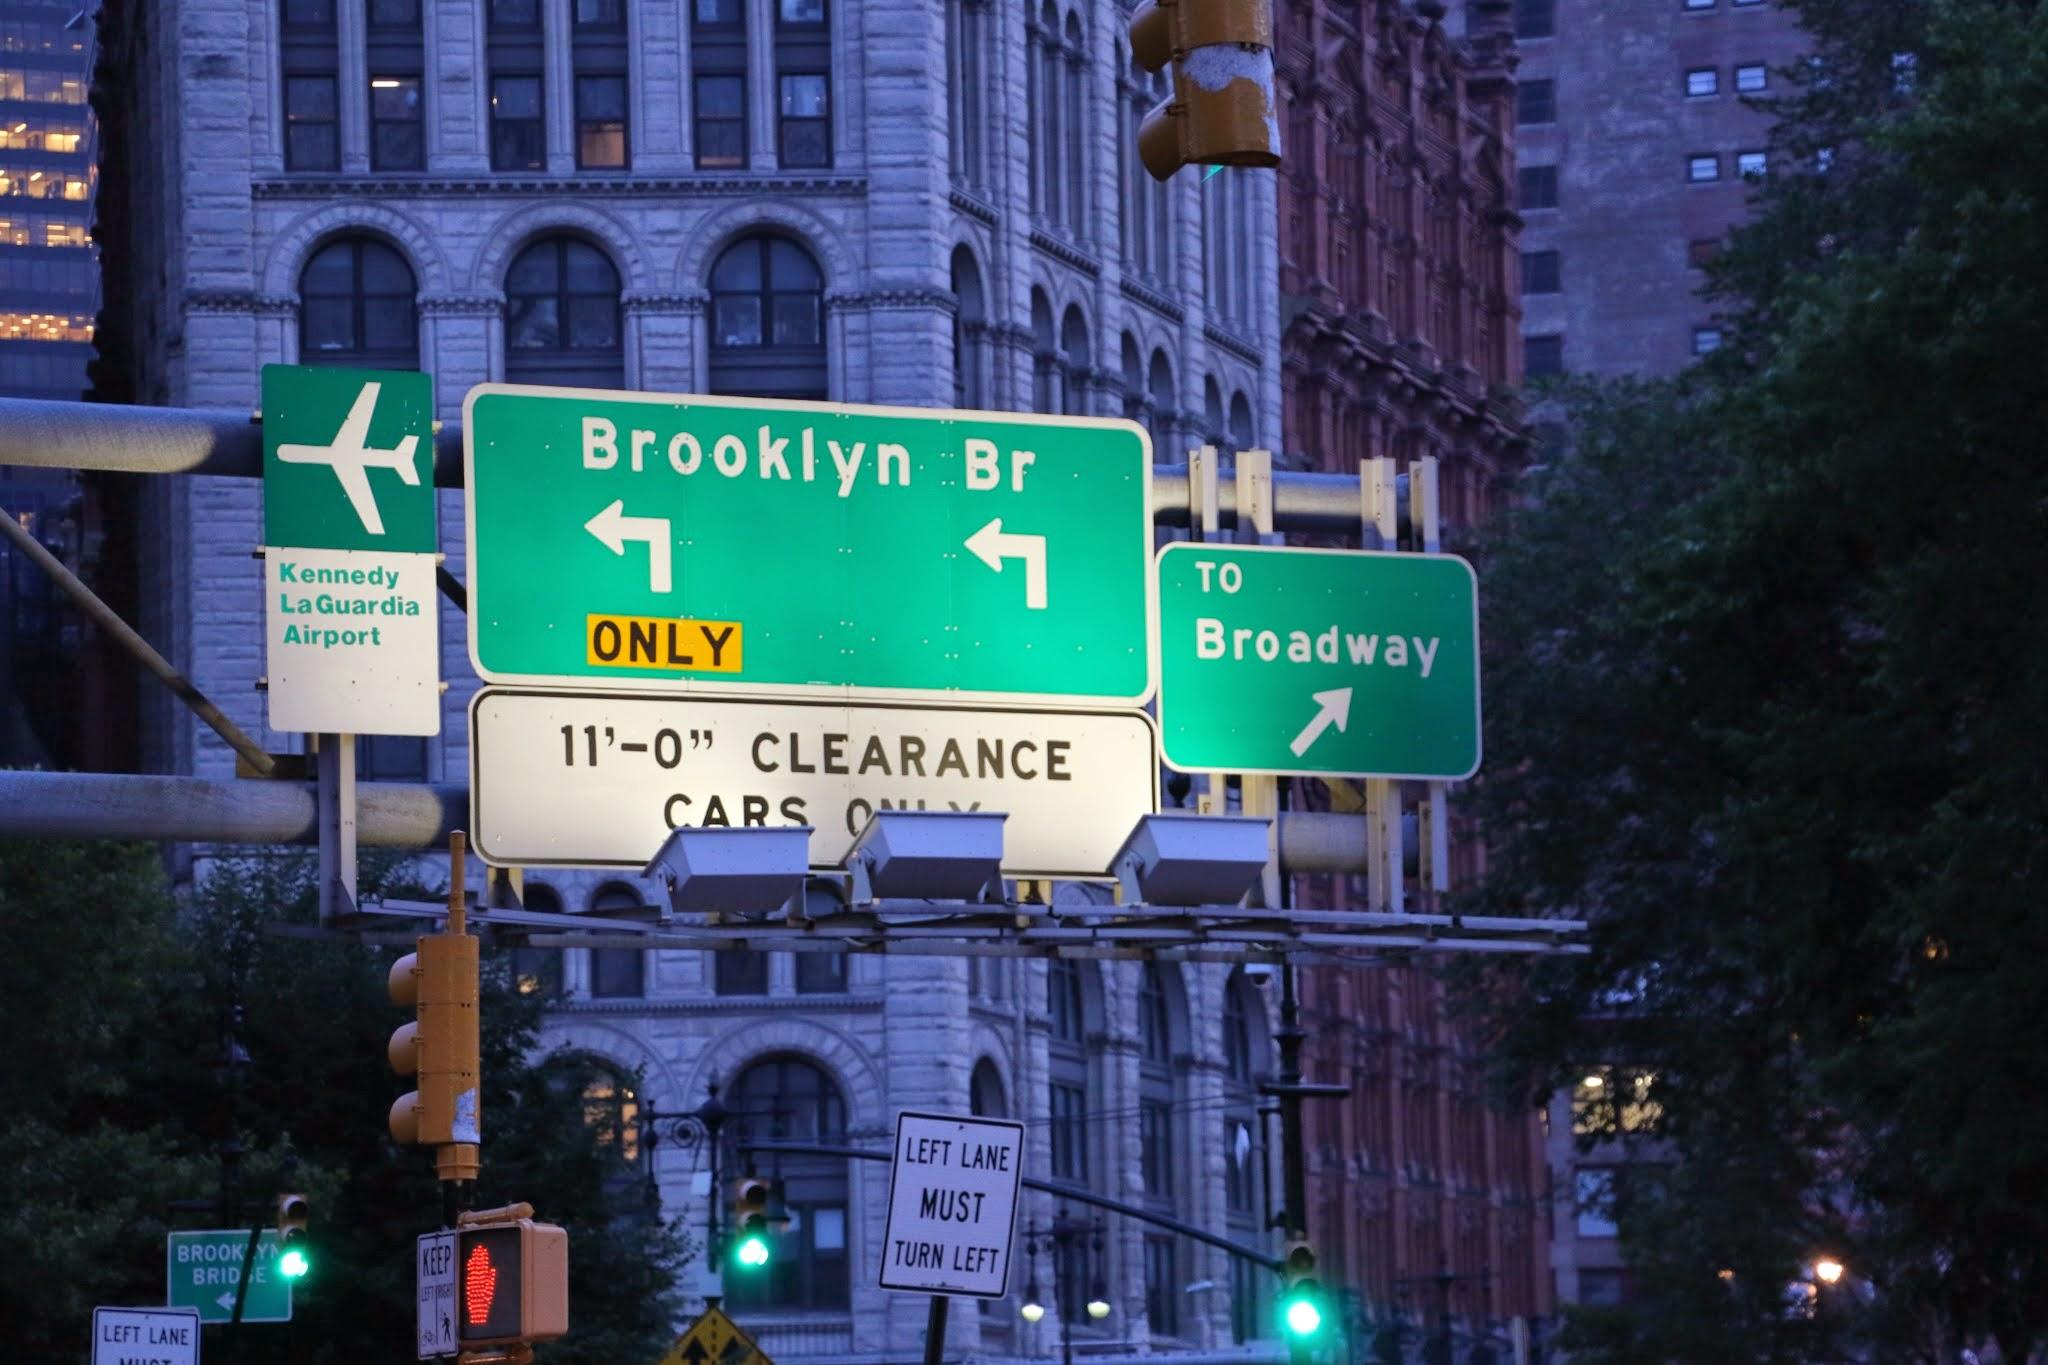 Brooklyn Bridge wegwijzer